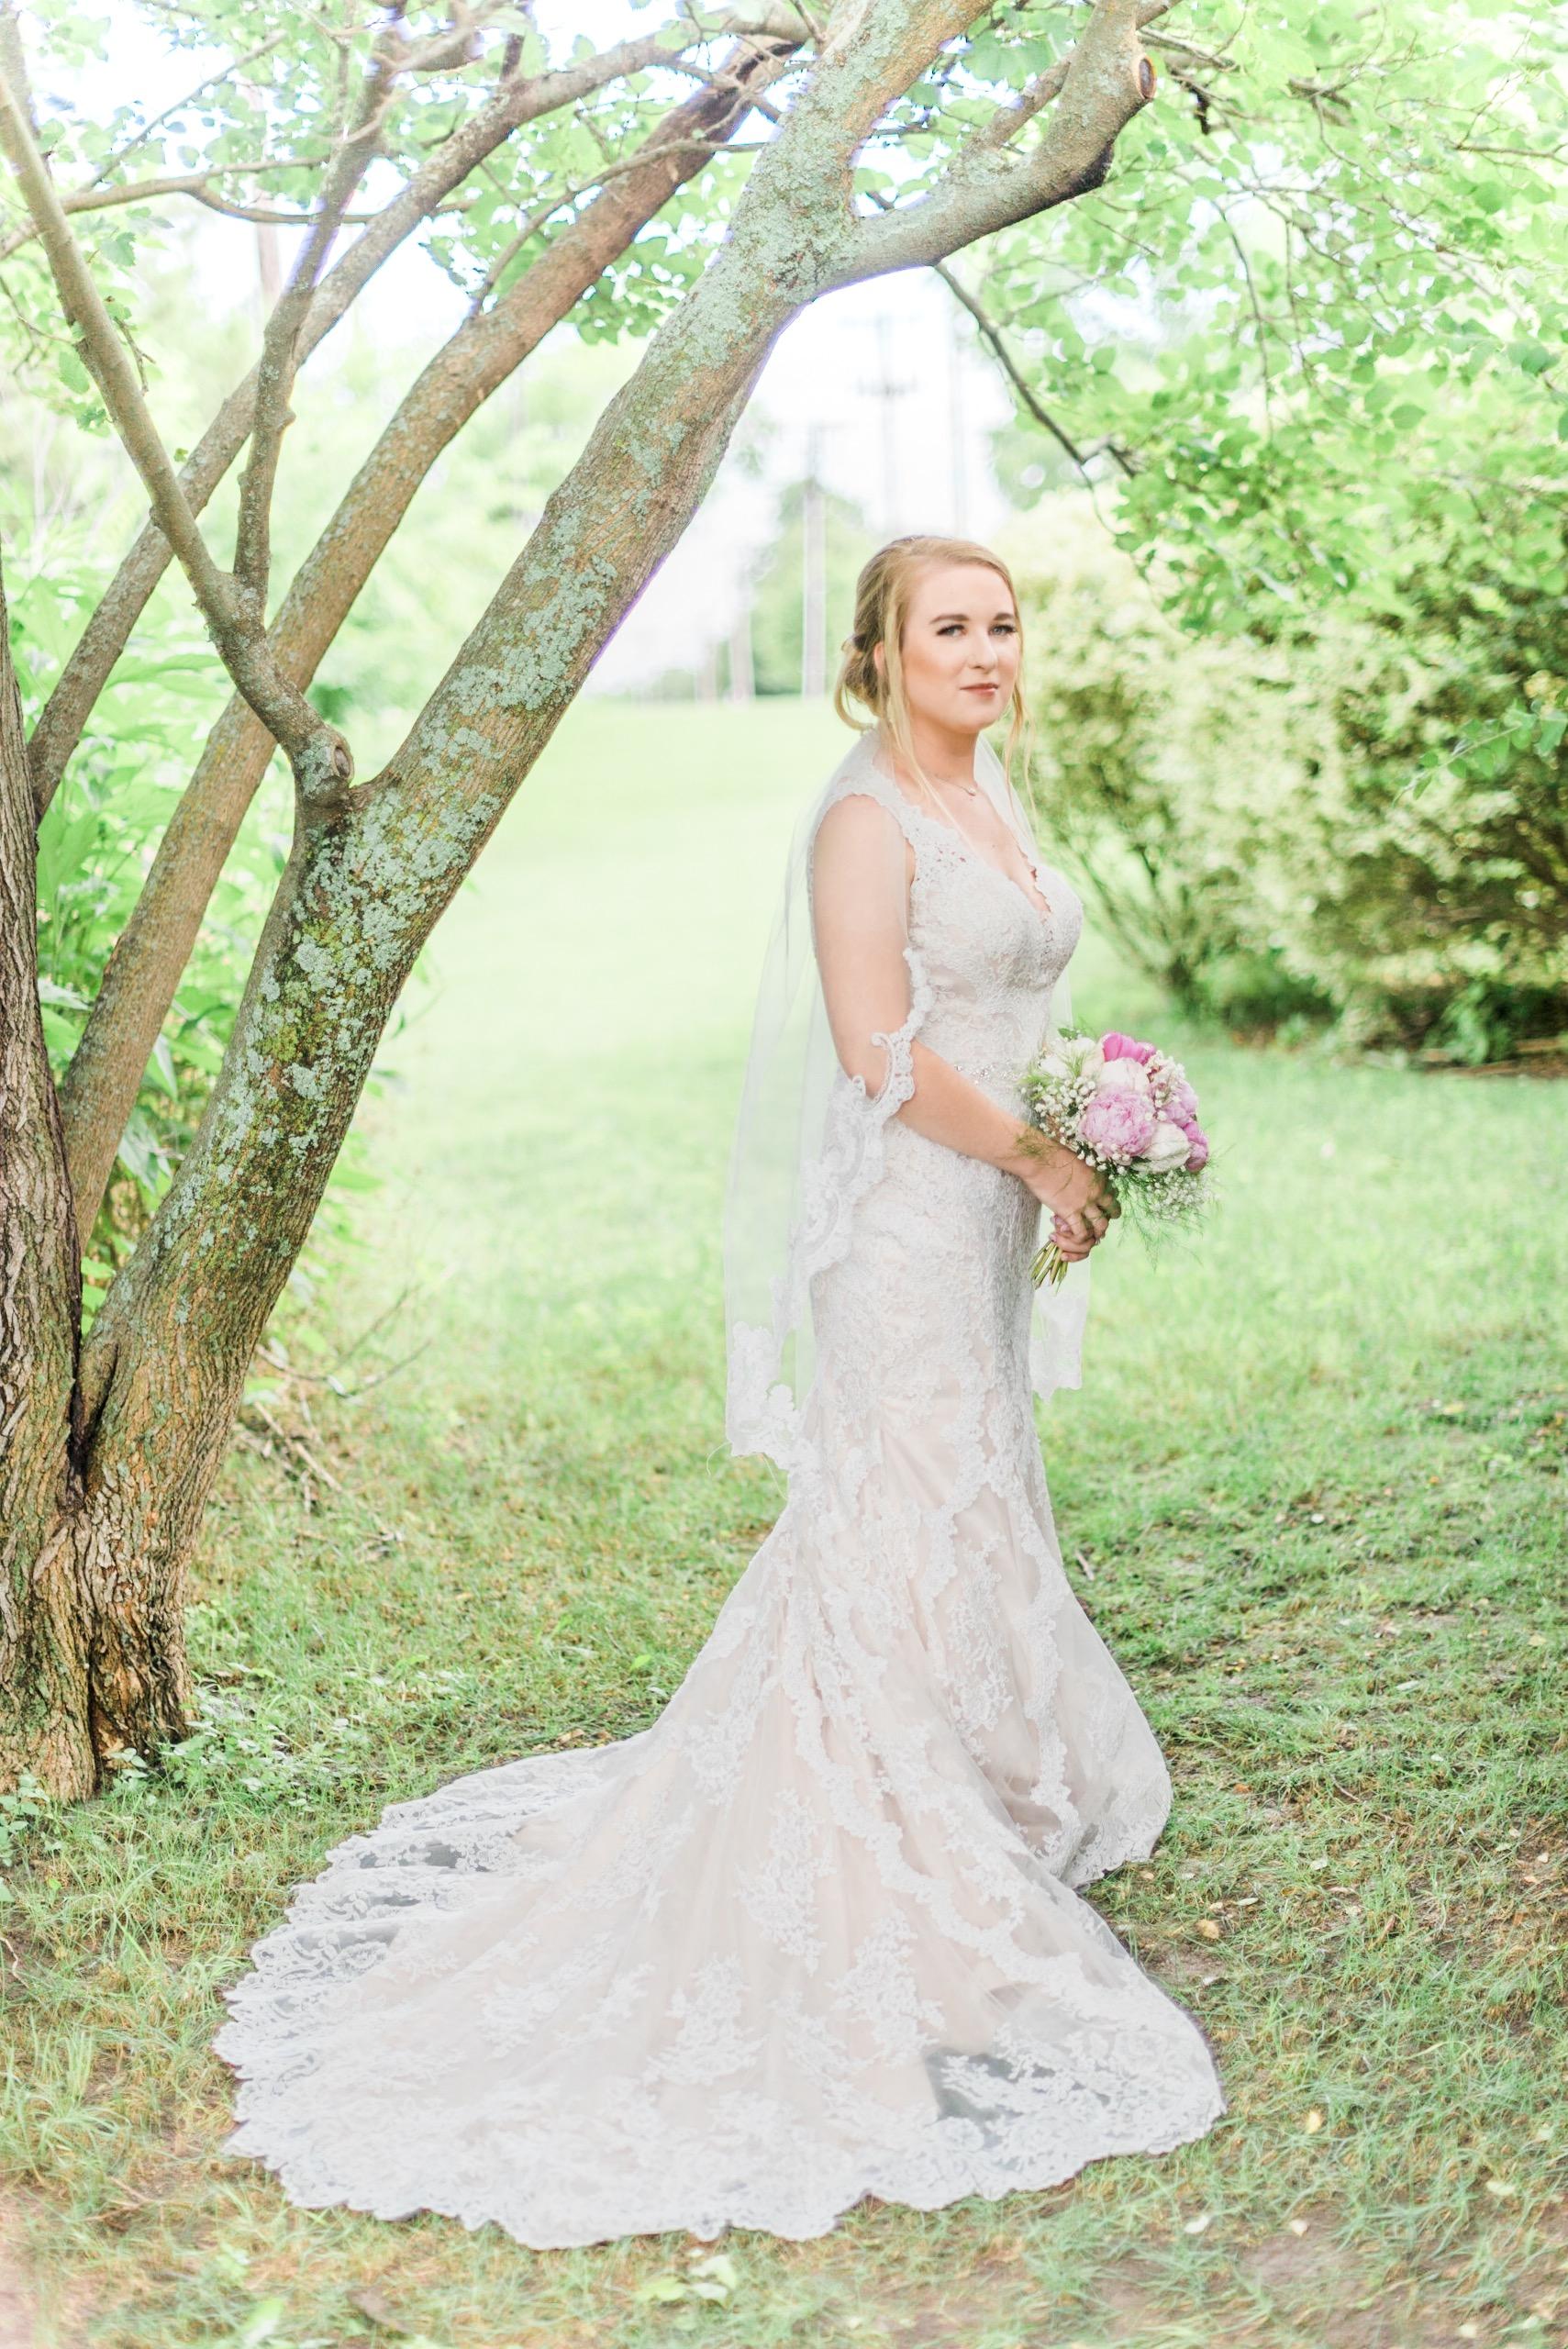 Brooke Summers Photography | Hunter + Micah Blog